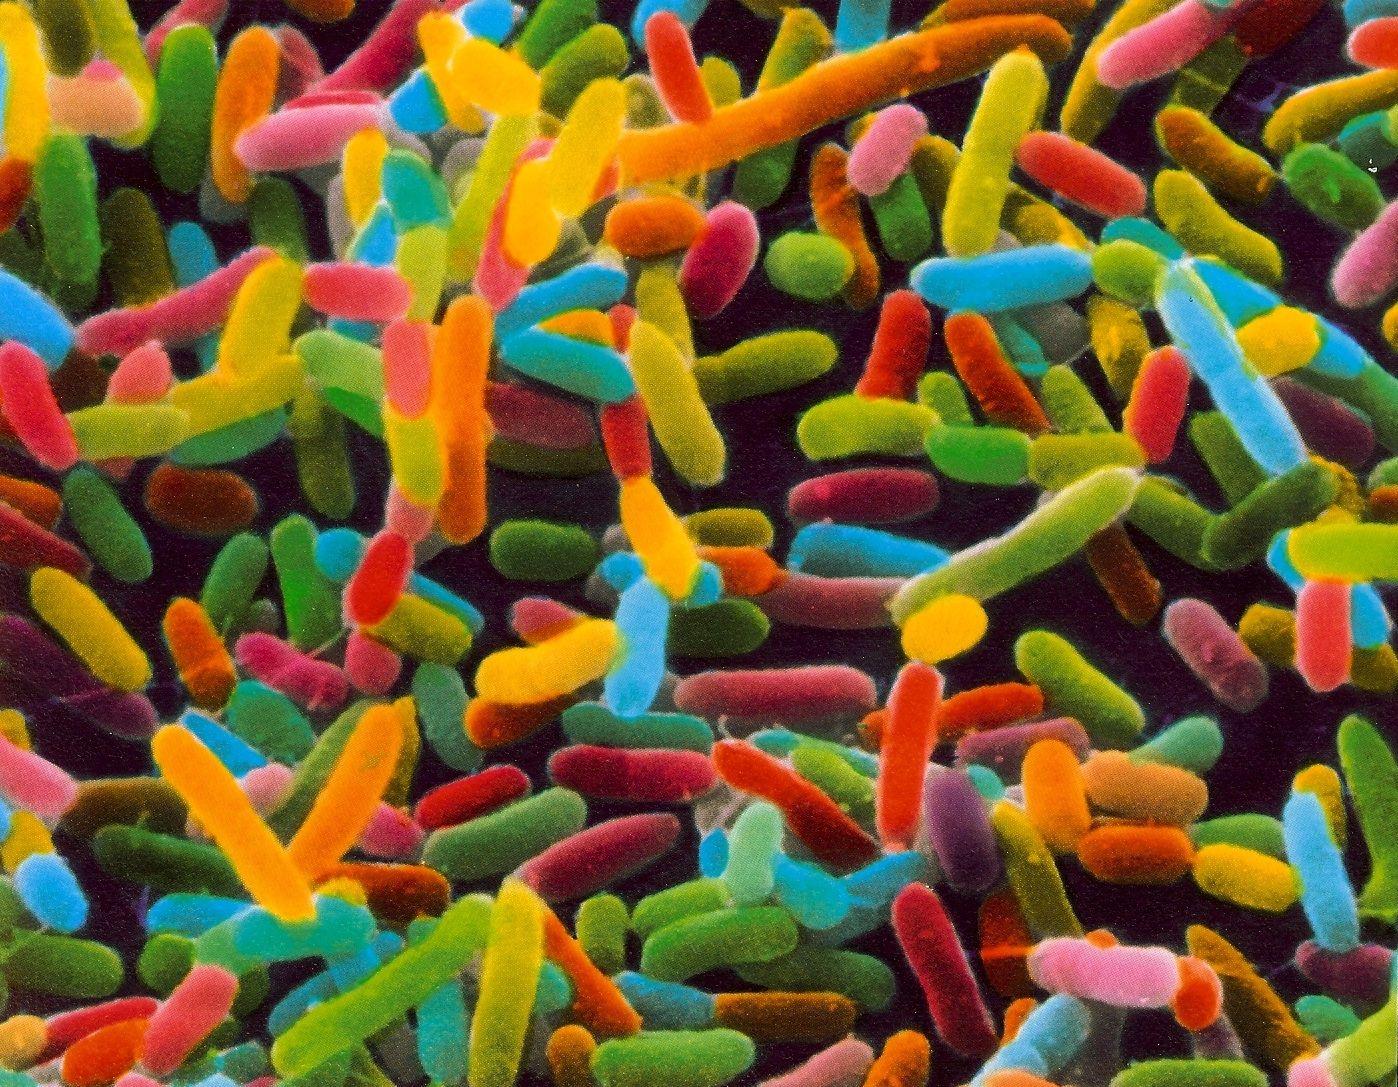 No Jellybeans ... but ...  E. coli [9400x magnification]